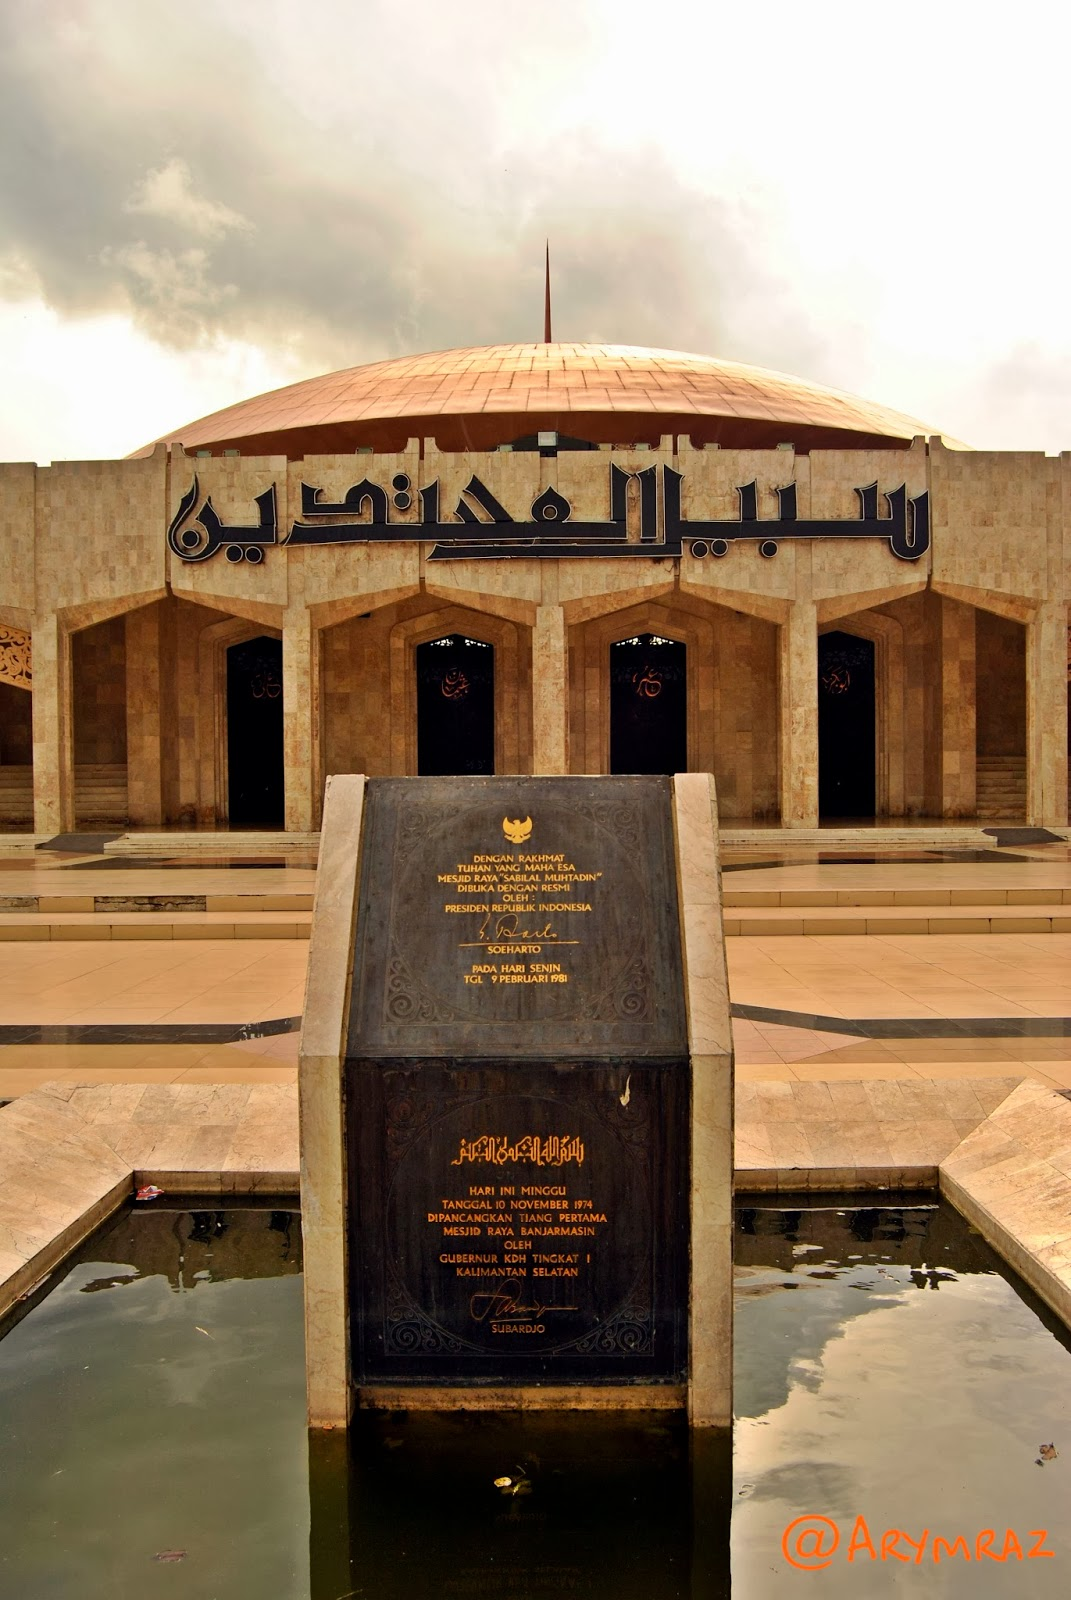 Ary Wardhana Yusuf Jejakku Mesjid Raya Sabilal Muhtadin 03 Masjid